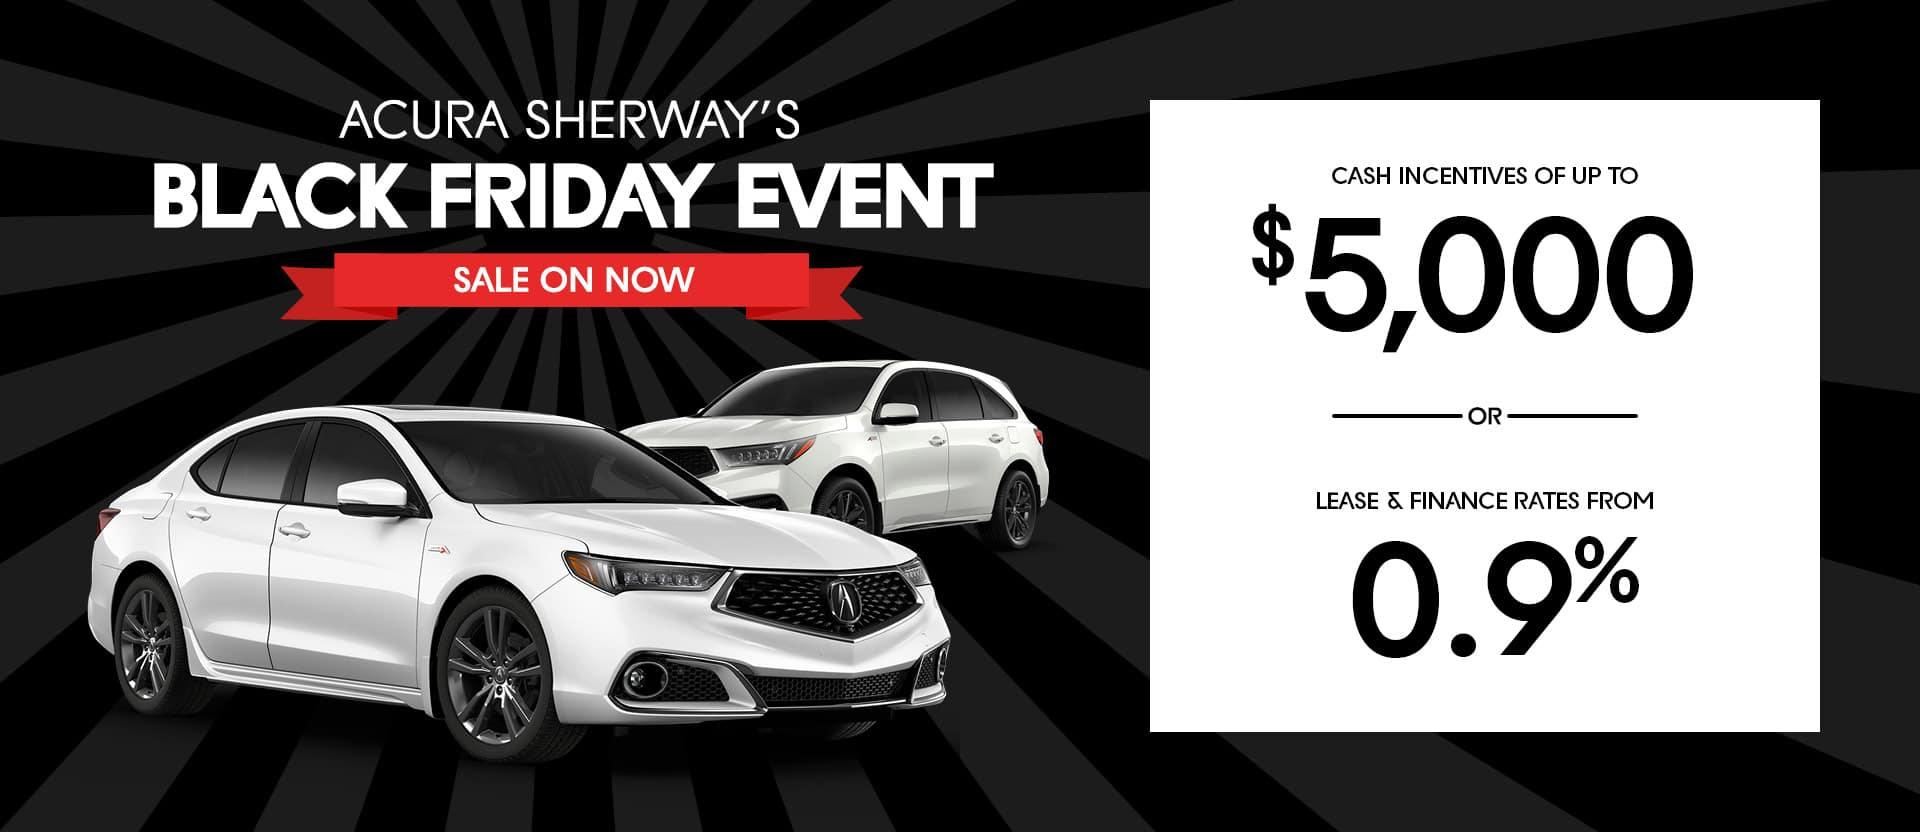 Acura Sherway Black Friday